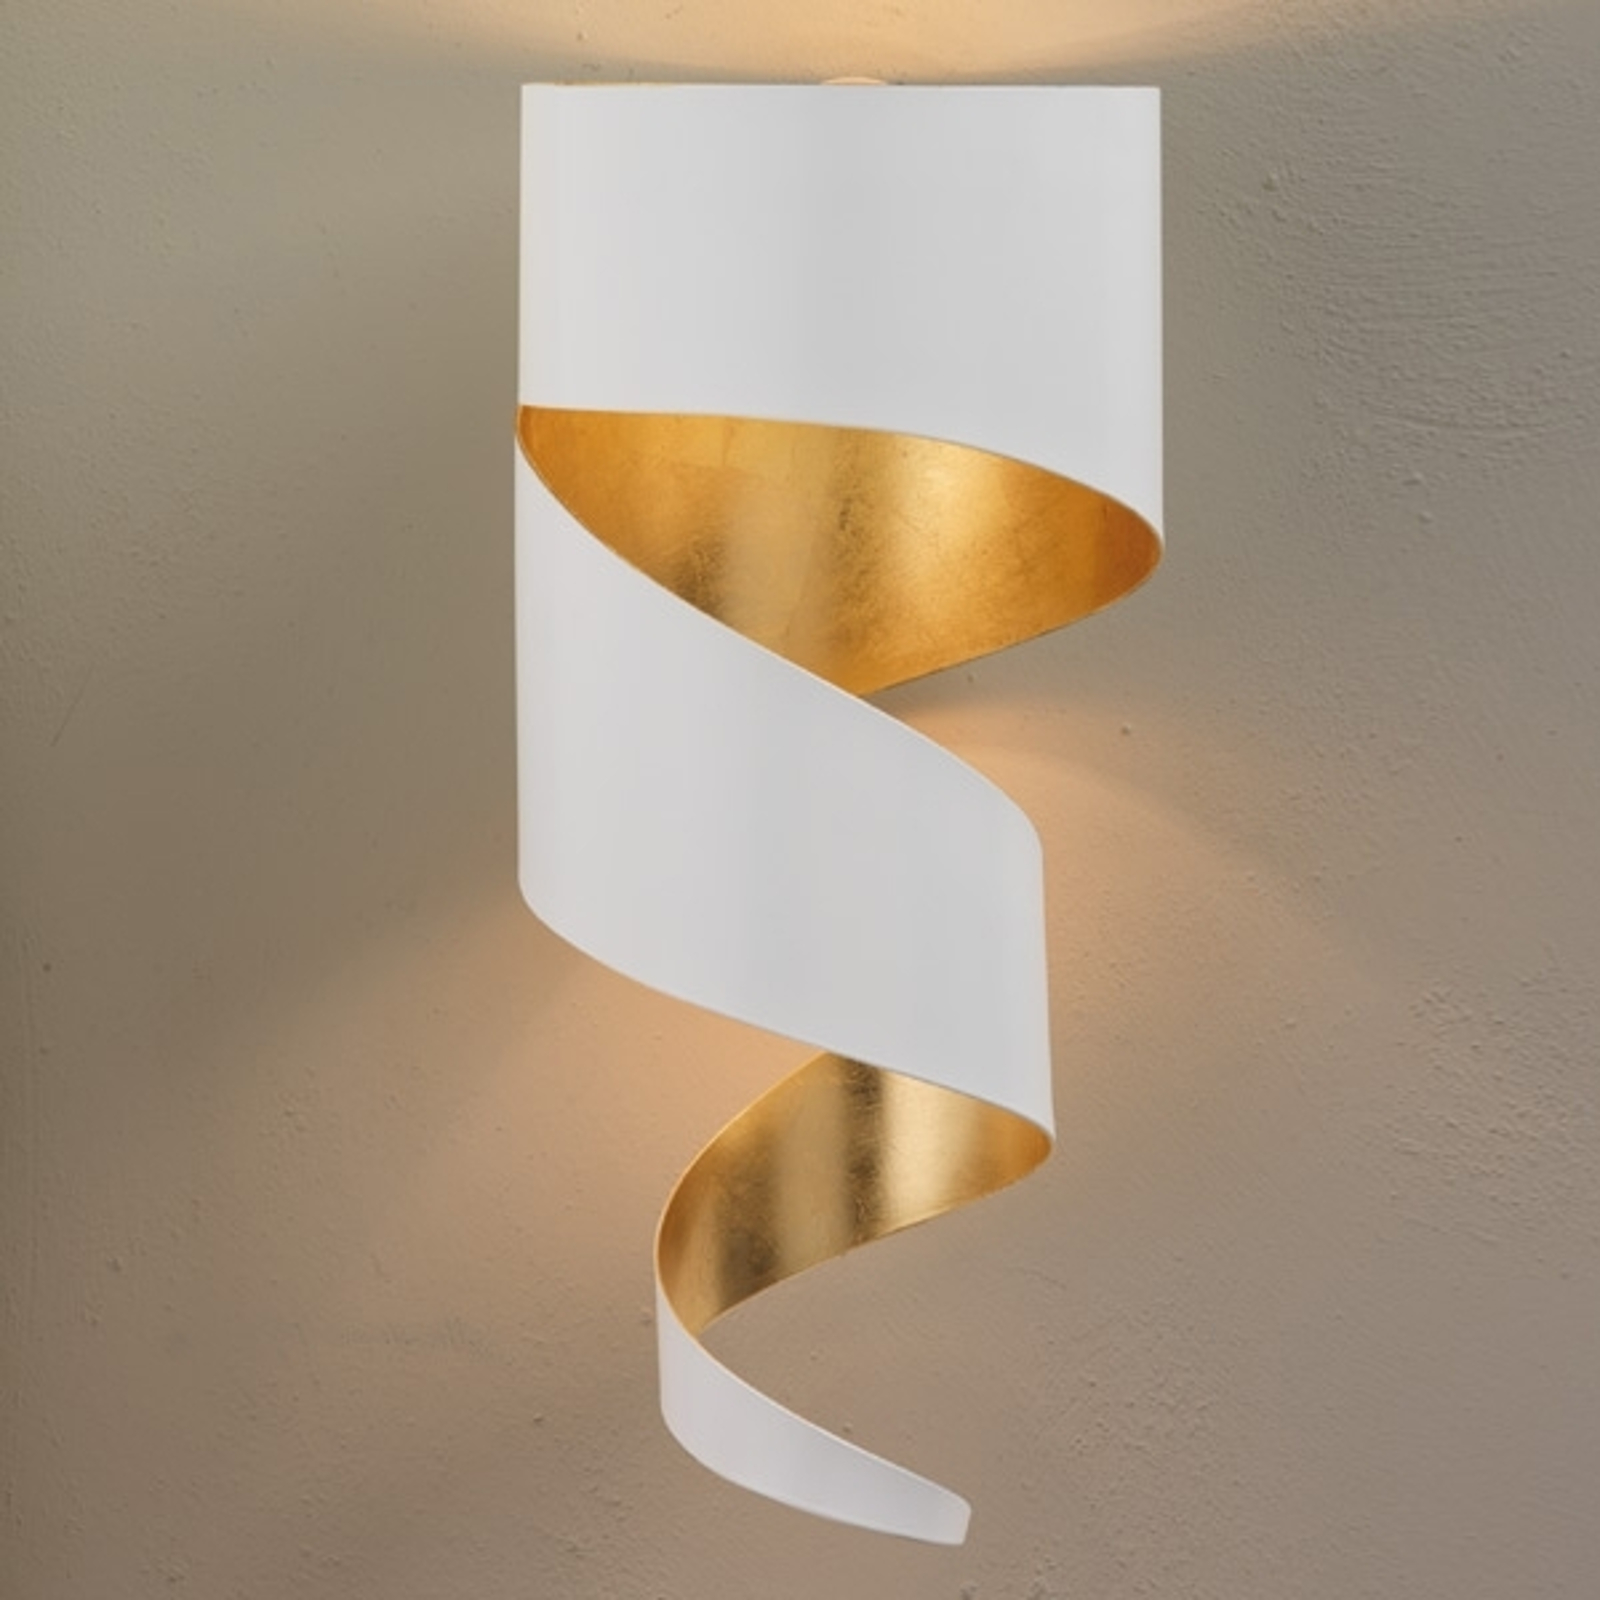 Remi attraktiv vegglampe, hvit-gull